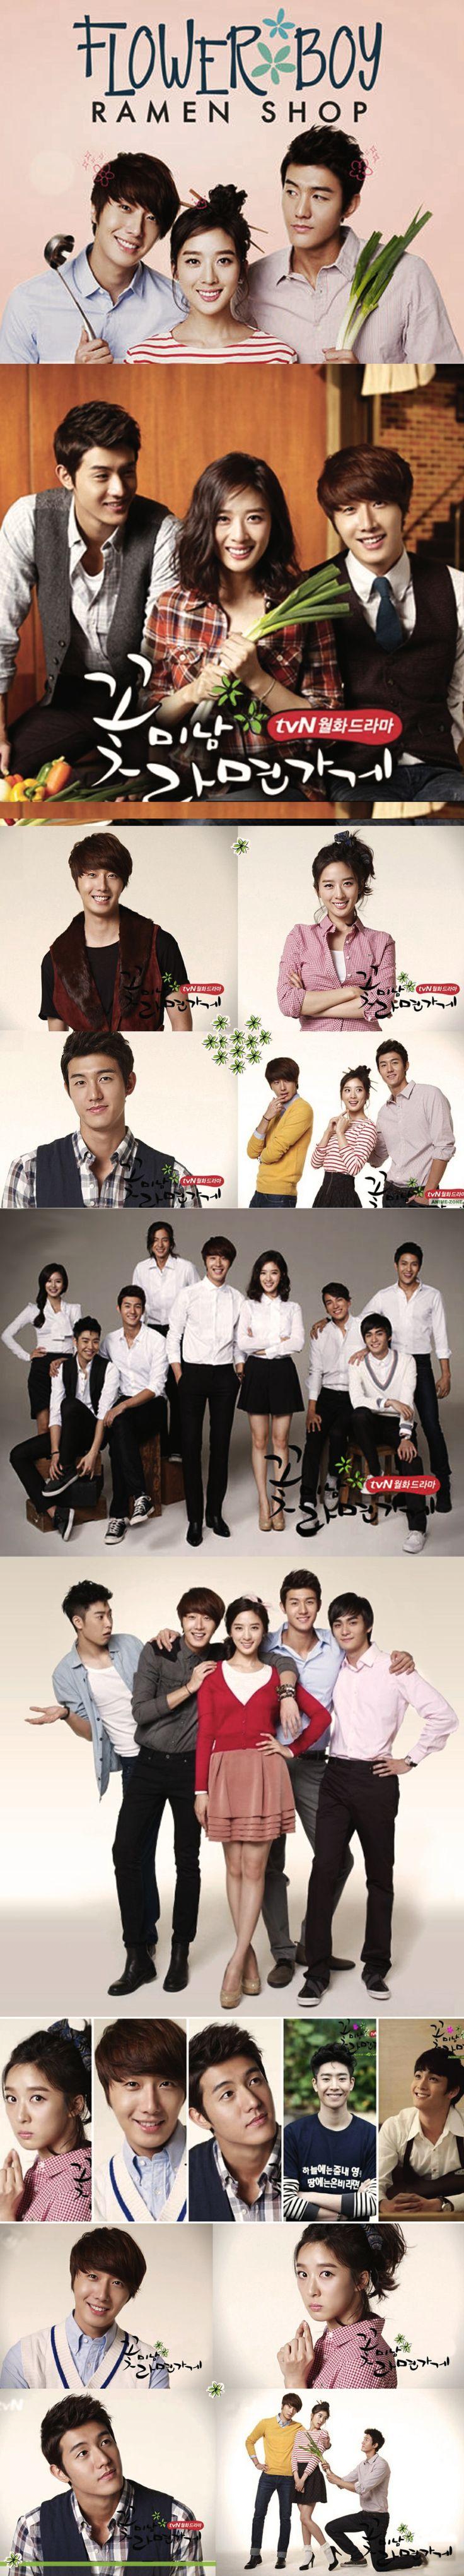 Flower Boy Ramen Shop (꽃미남 라면가게) - Kdrama 2011 - 16 episodes - Jung Il-woo / Lee Chung-ah / Lee Ki-woo / Park Min-woo / Jo Yoon-woo